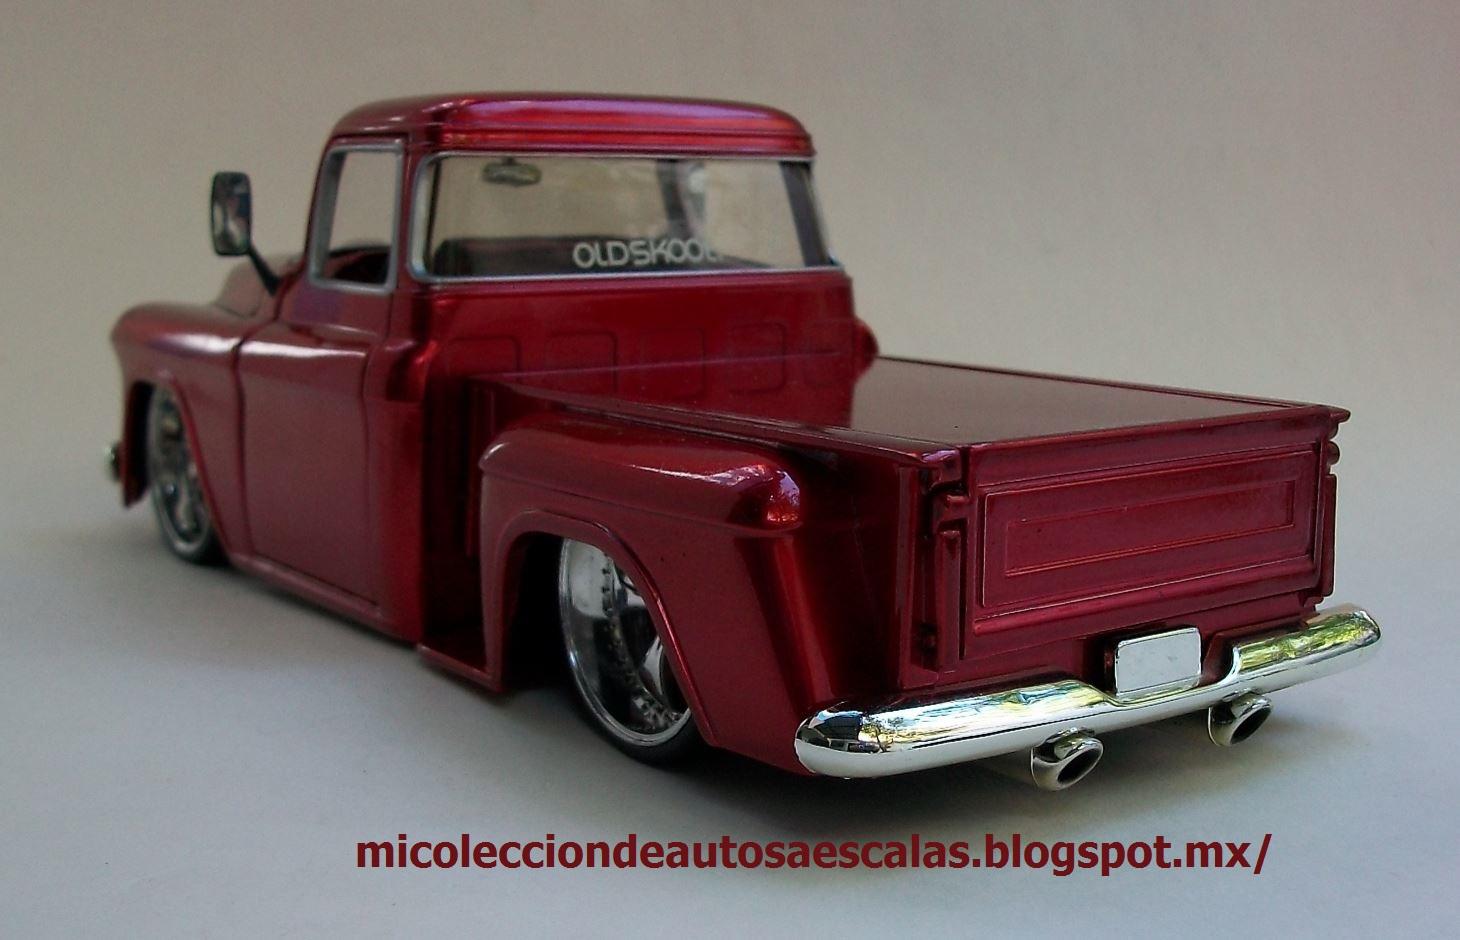 Mi Coleccin De Autos A Escala 1955 Chevy Stepside Jada 1 24 C10